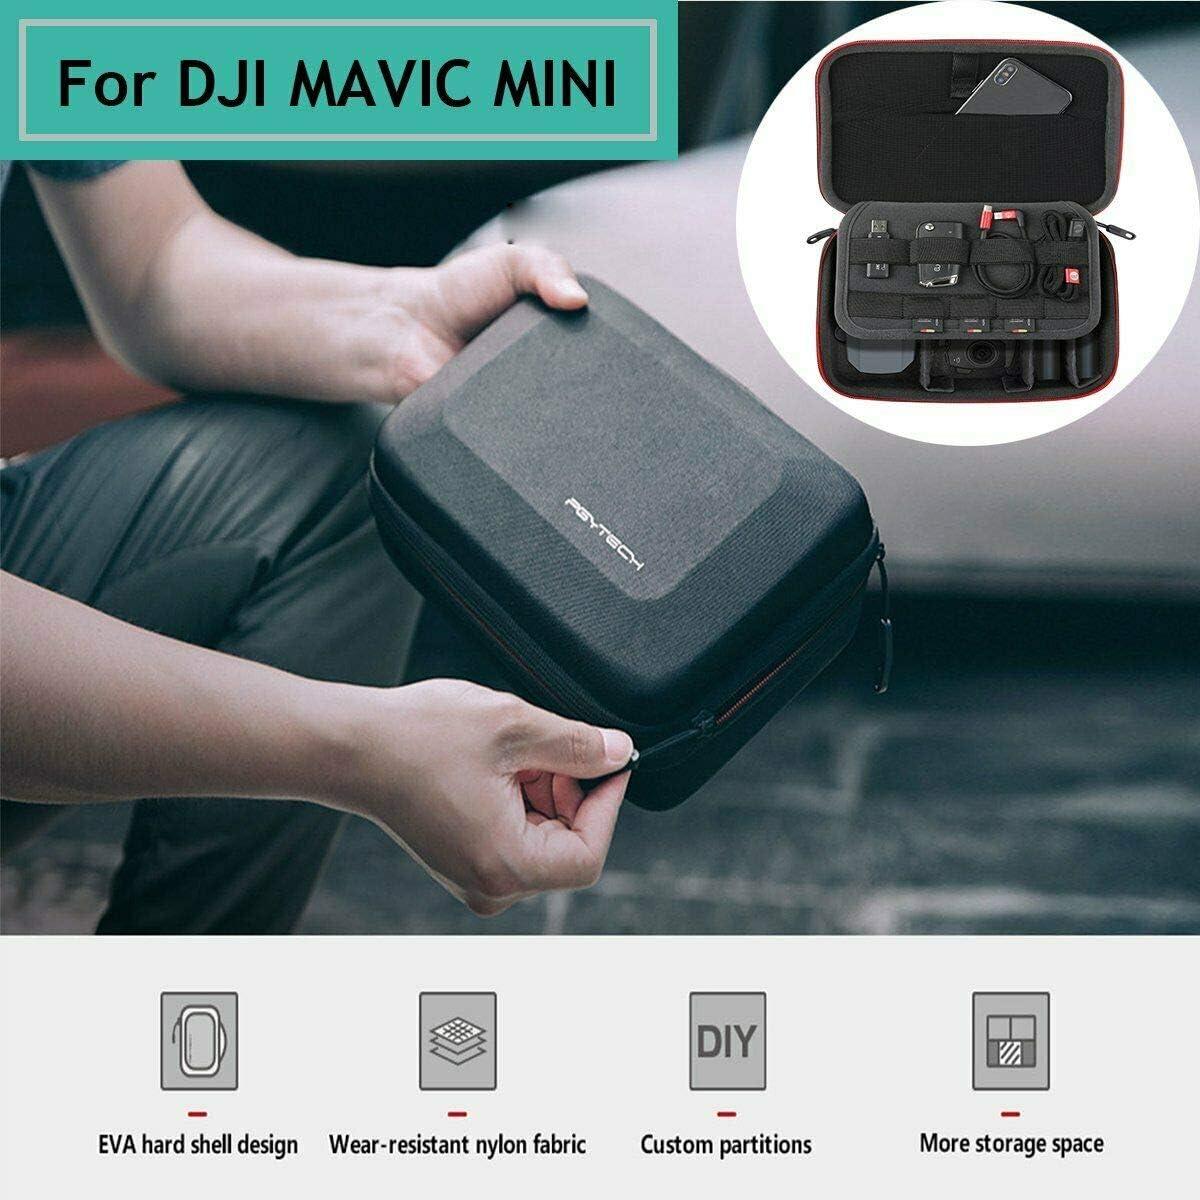 Estuche portátil para DJI Mavic Mini / Mini 2 Accesorios